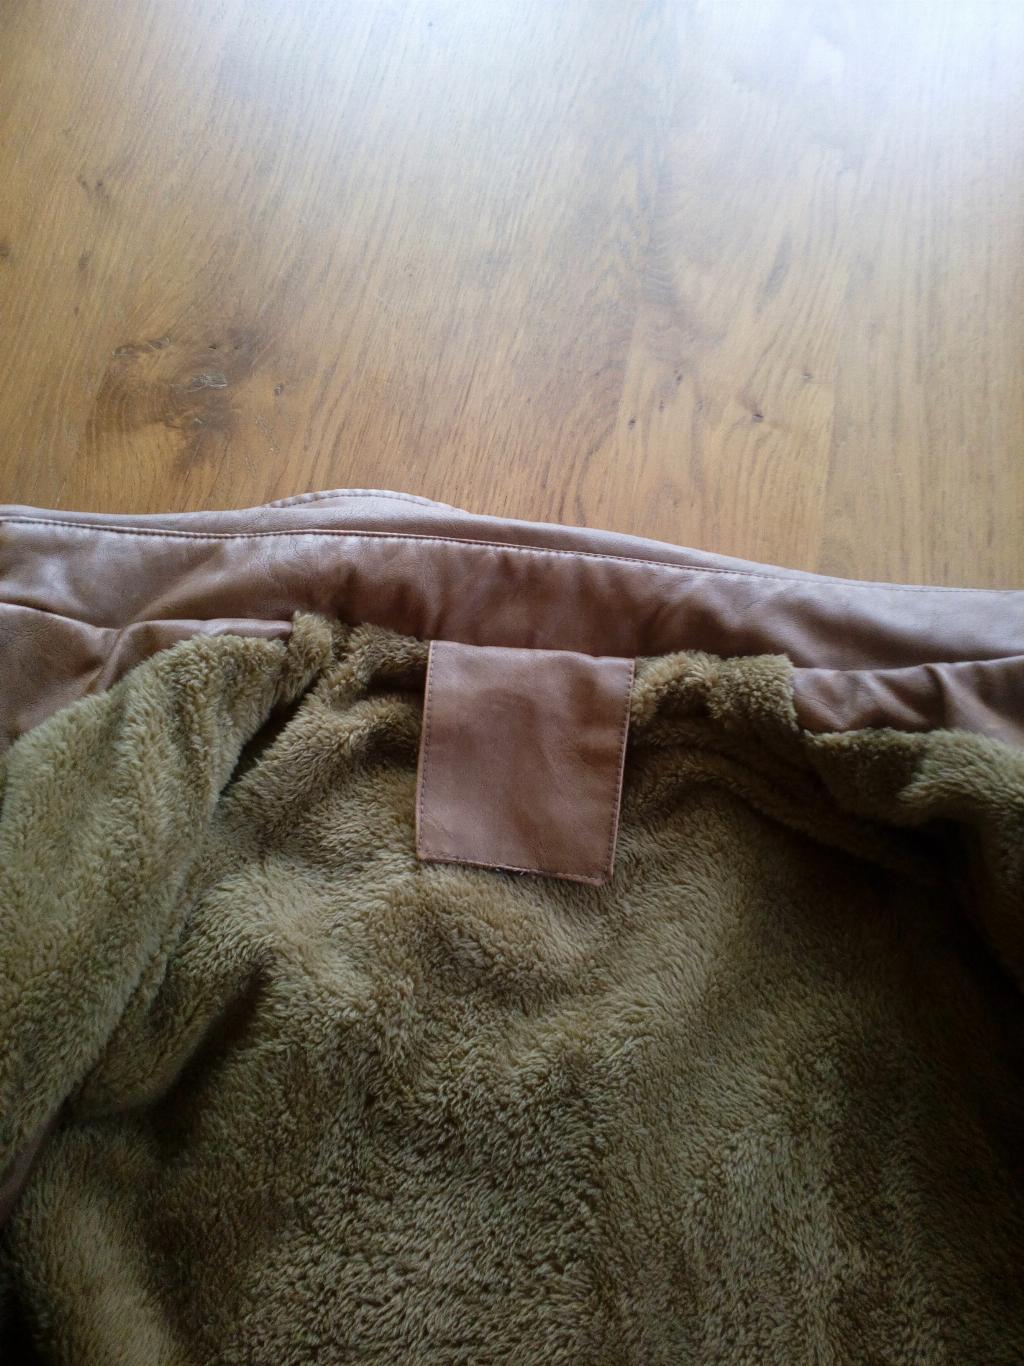 d1be27a6964 Onderhoud en behoud van je kleding